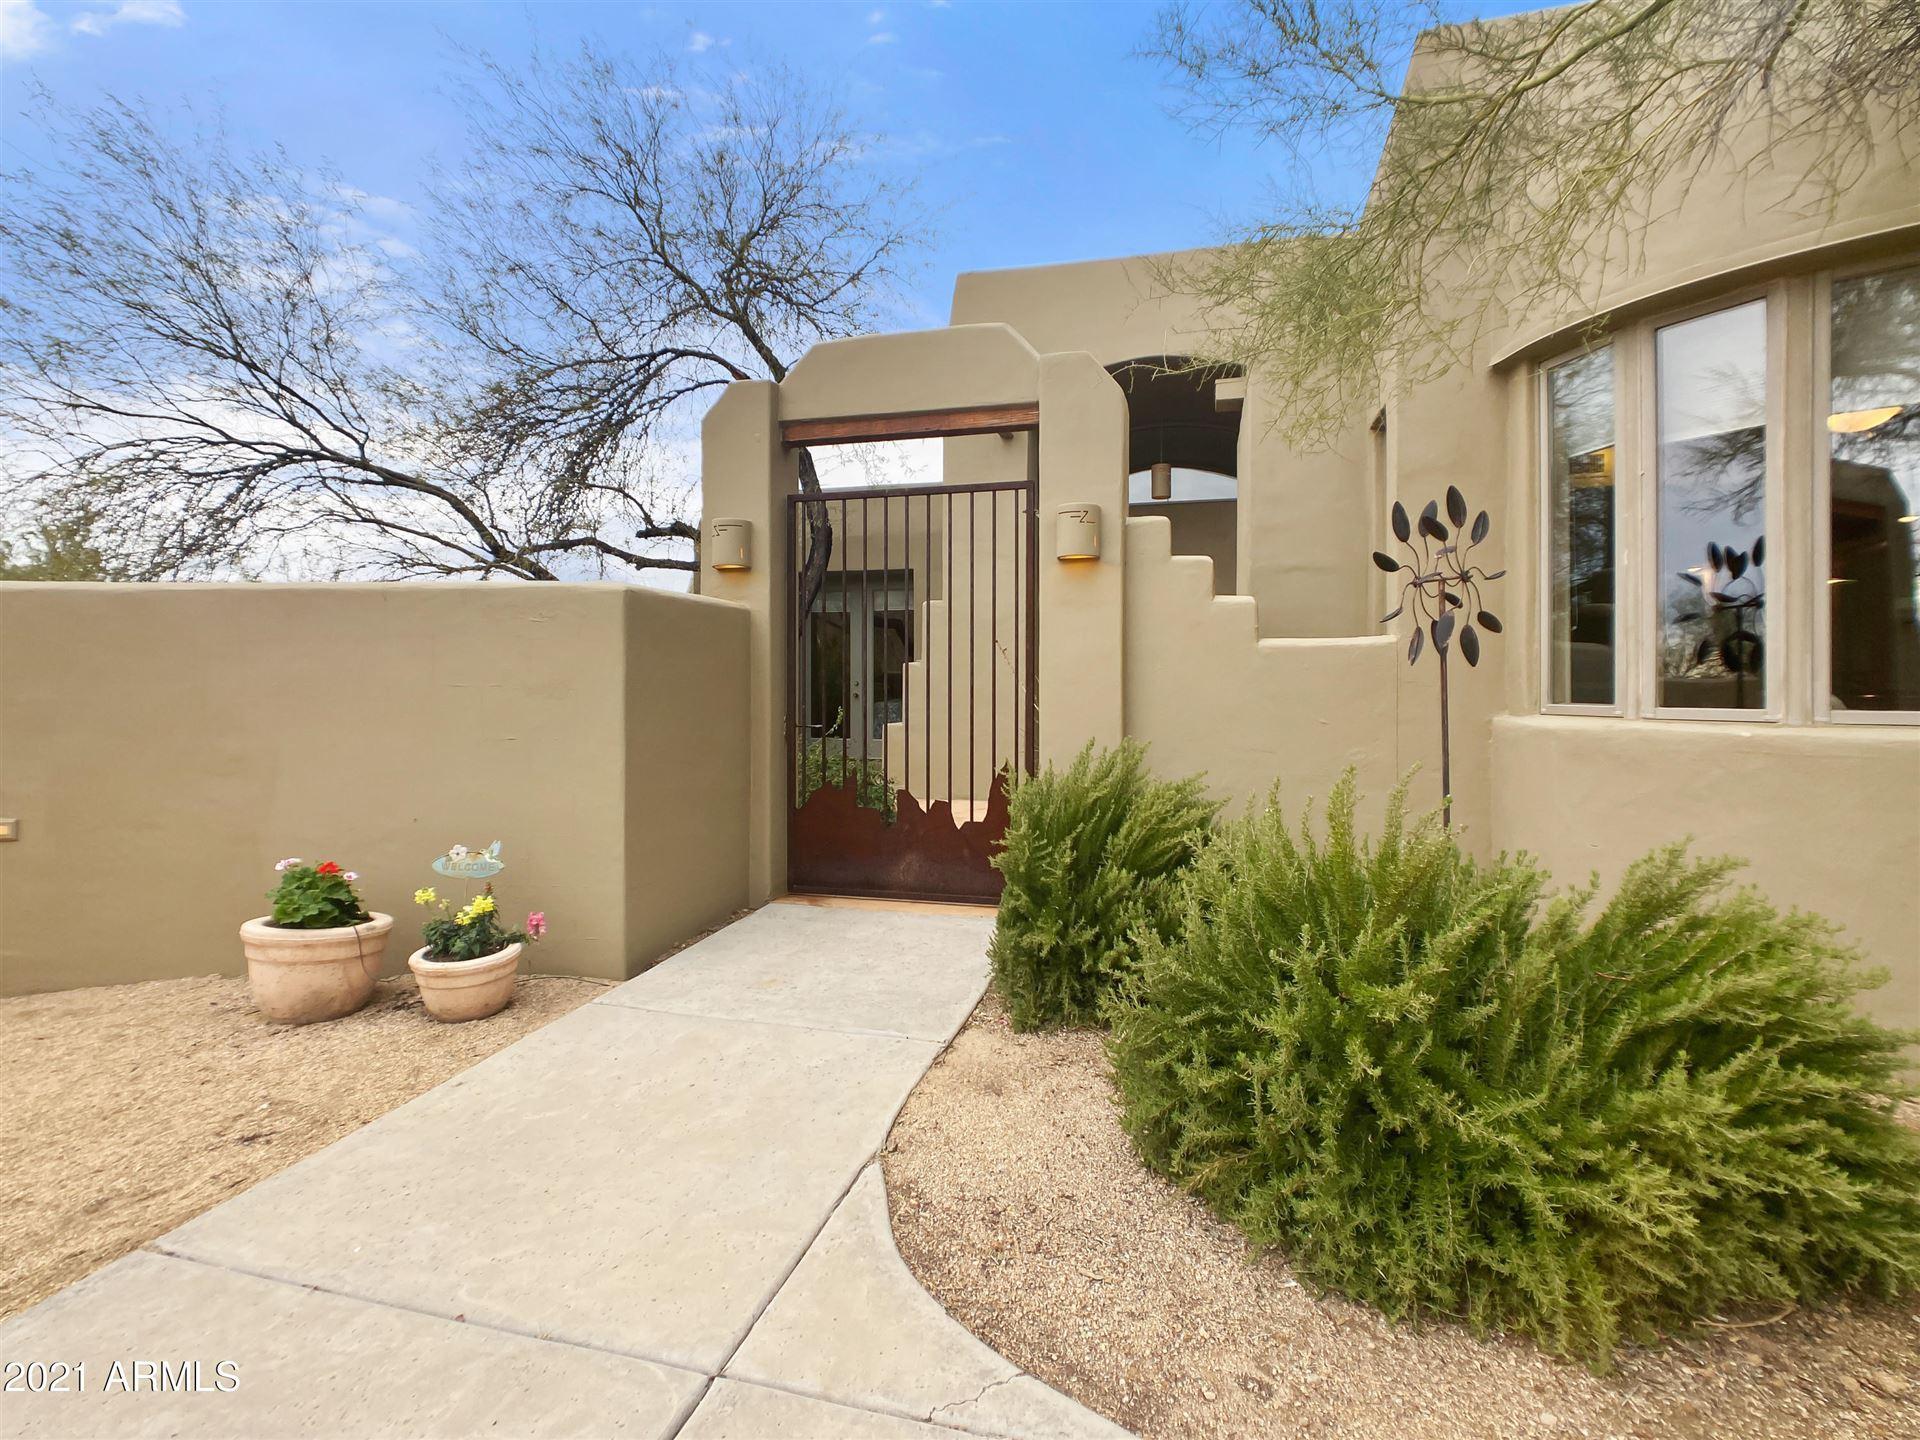 Photo of 5805 E AGAVE Place, Carefree, AZ 85377 (MLS # 6194389)